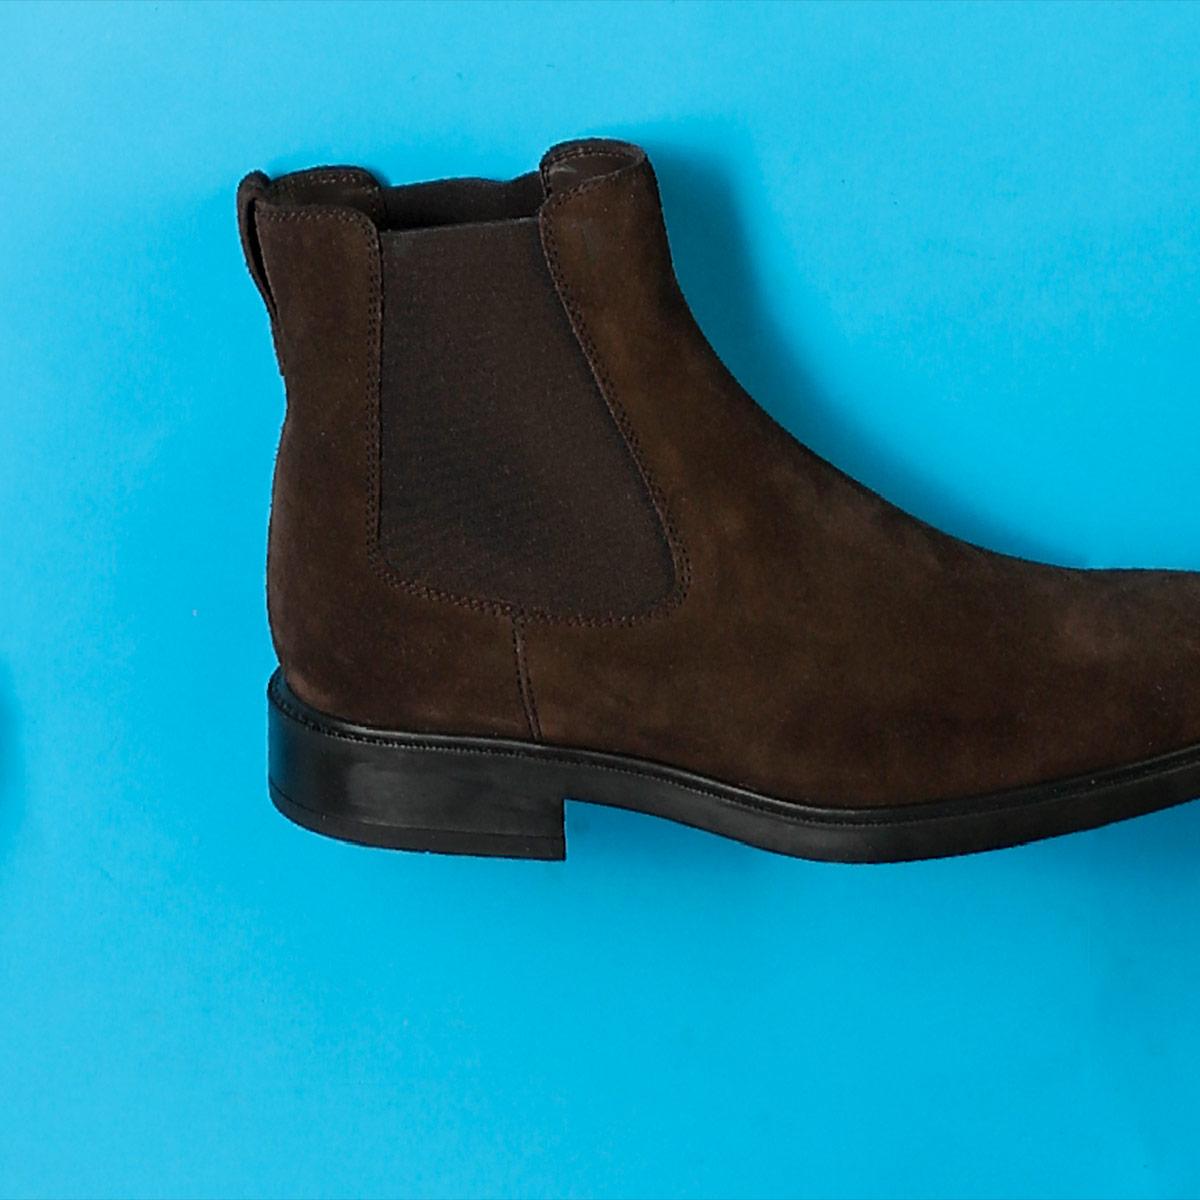 6b476004cf Men's Designer Shoes Online Store: Spring-Summer 2018 Fashion ...